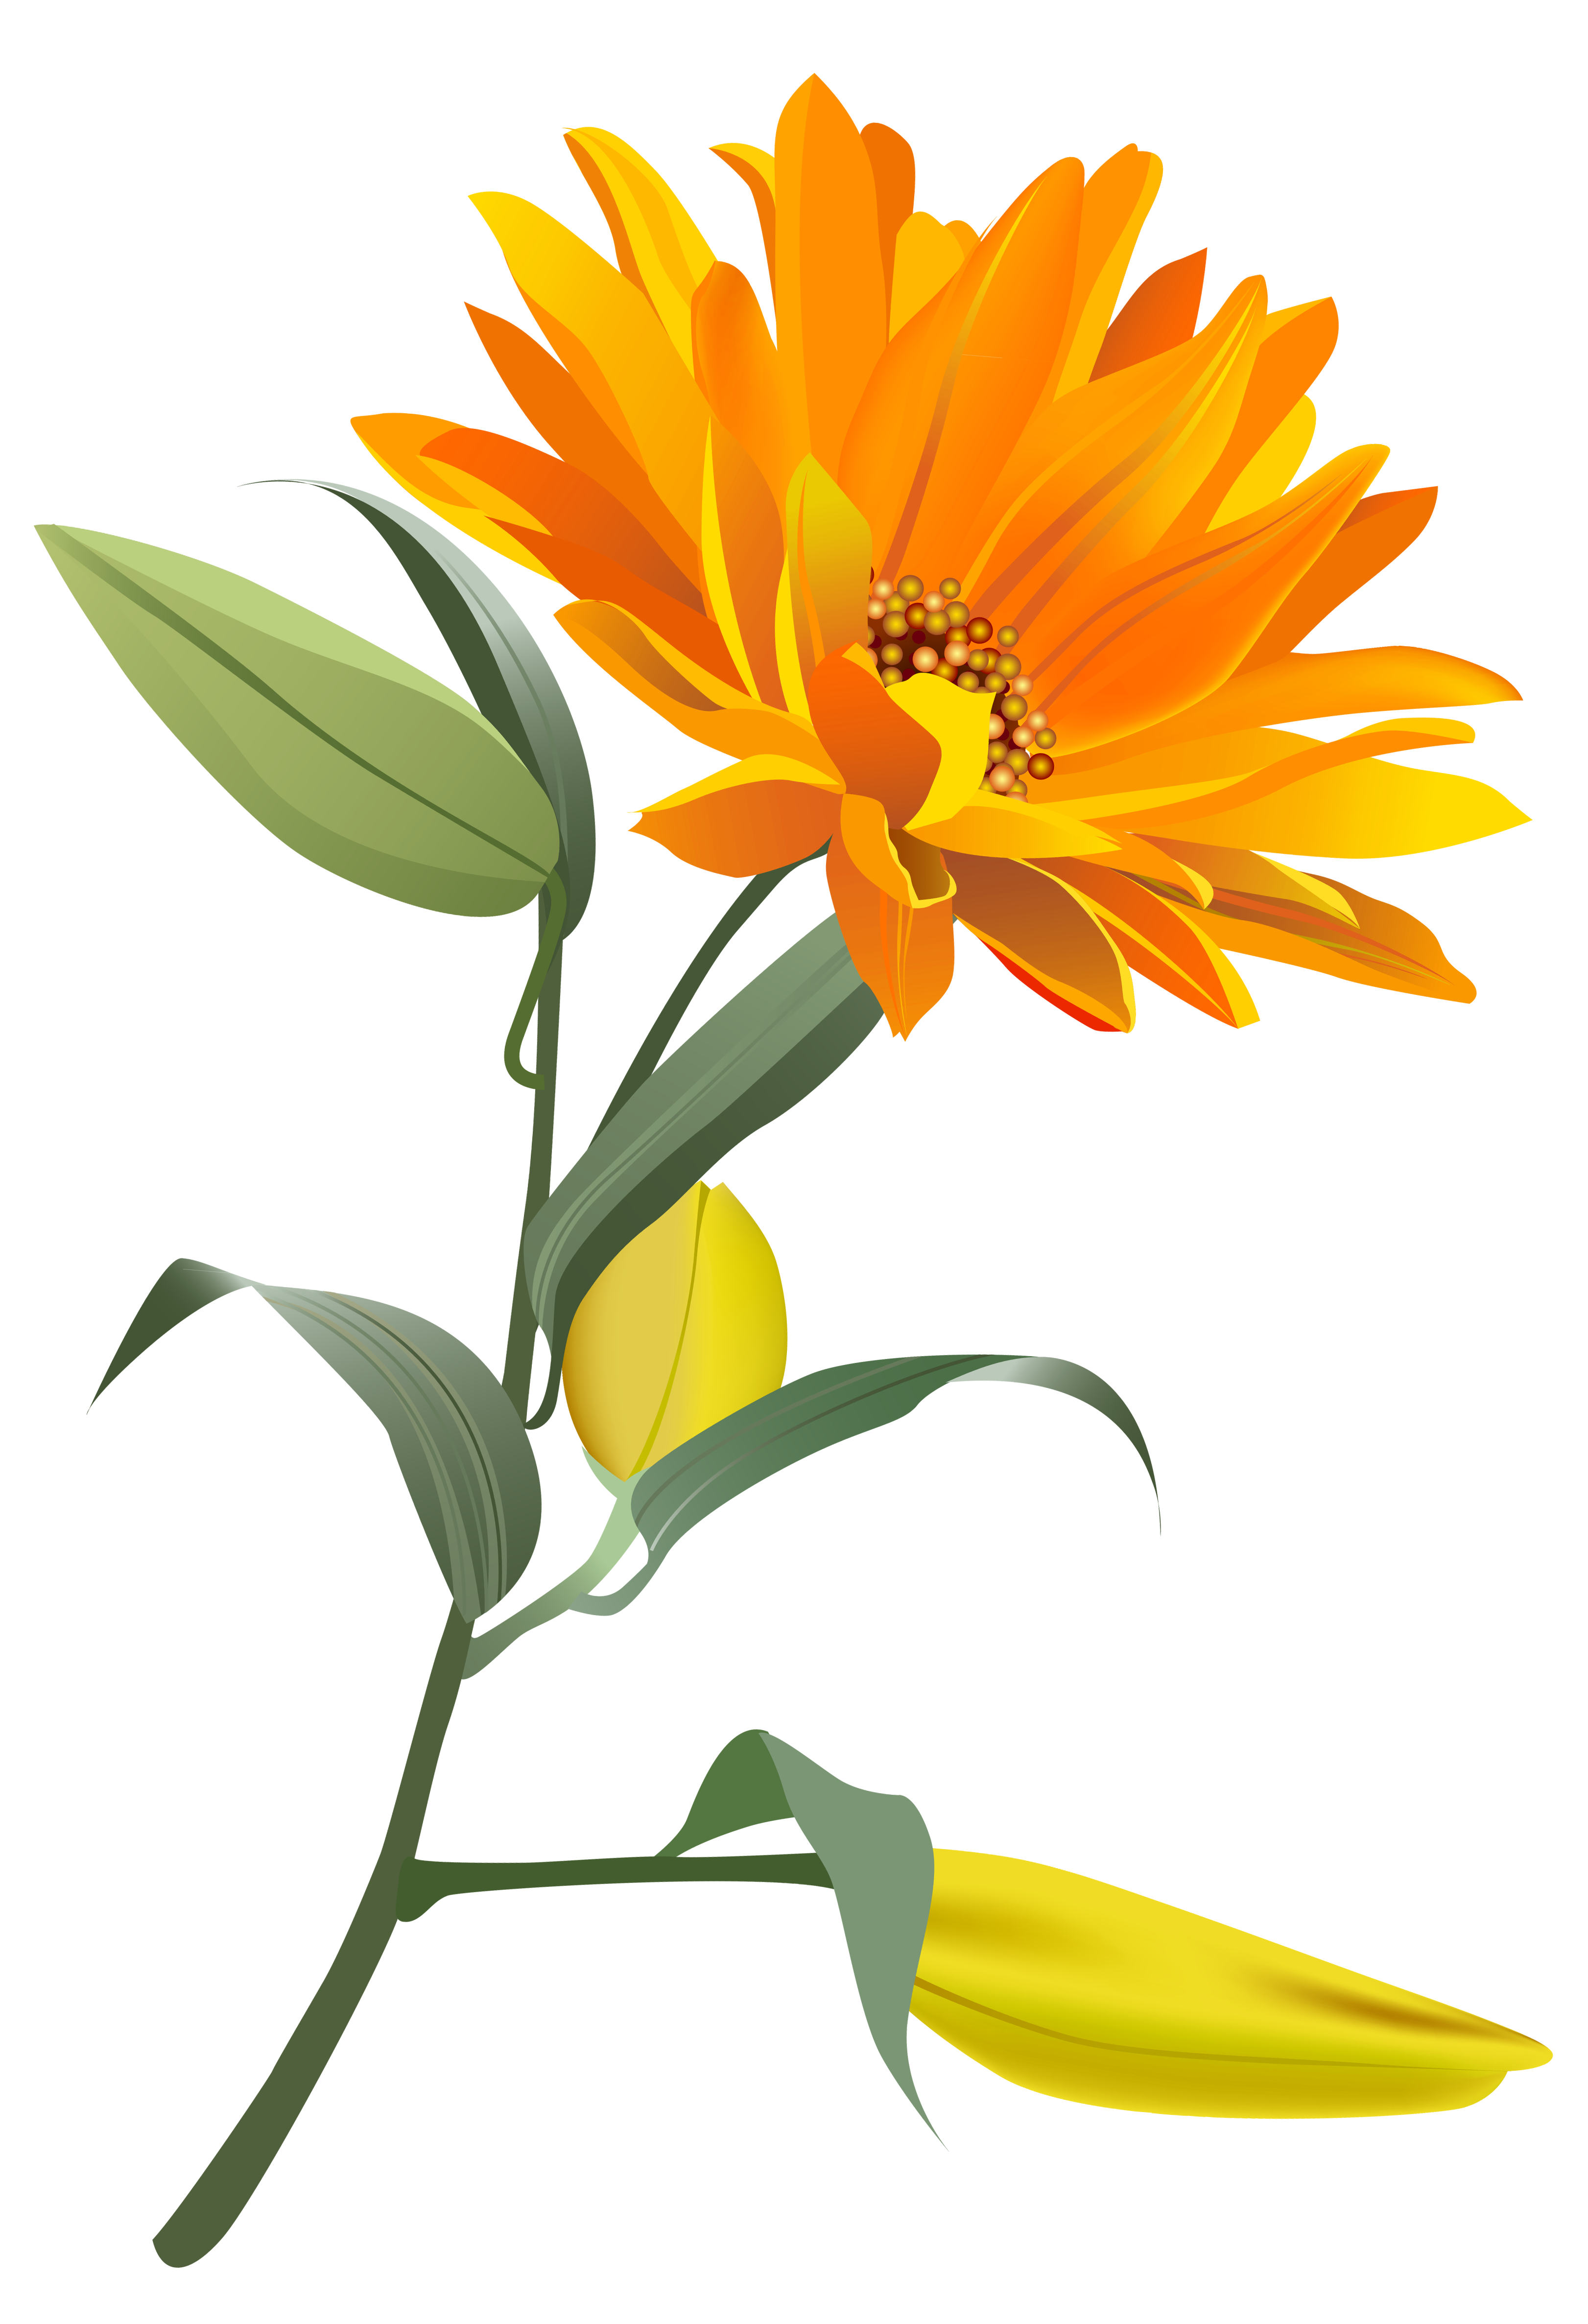 Orange Flower clipart transparent Yopriceville Gallery flowers Image Art